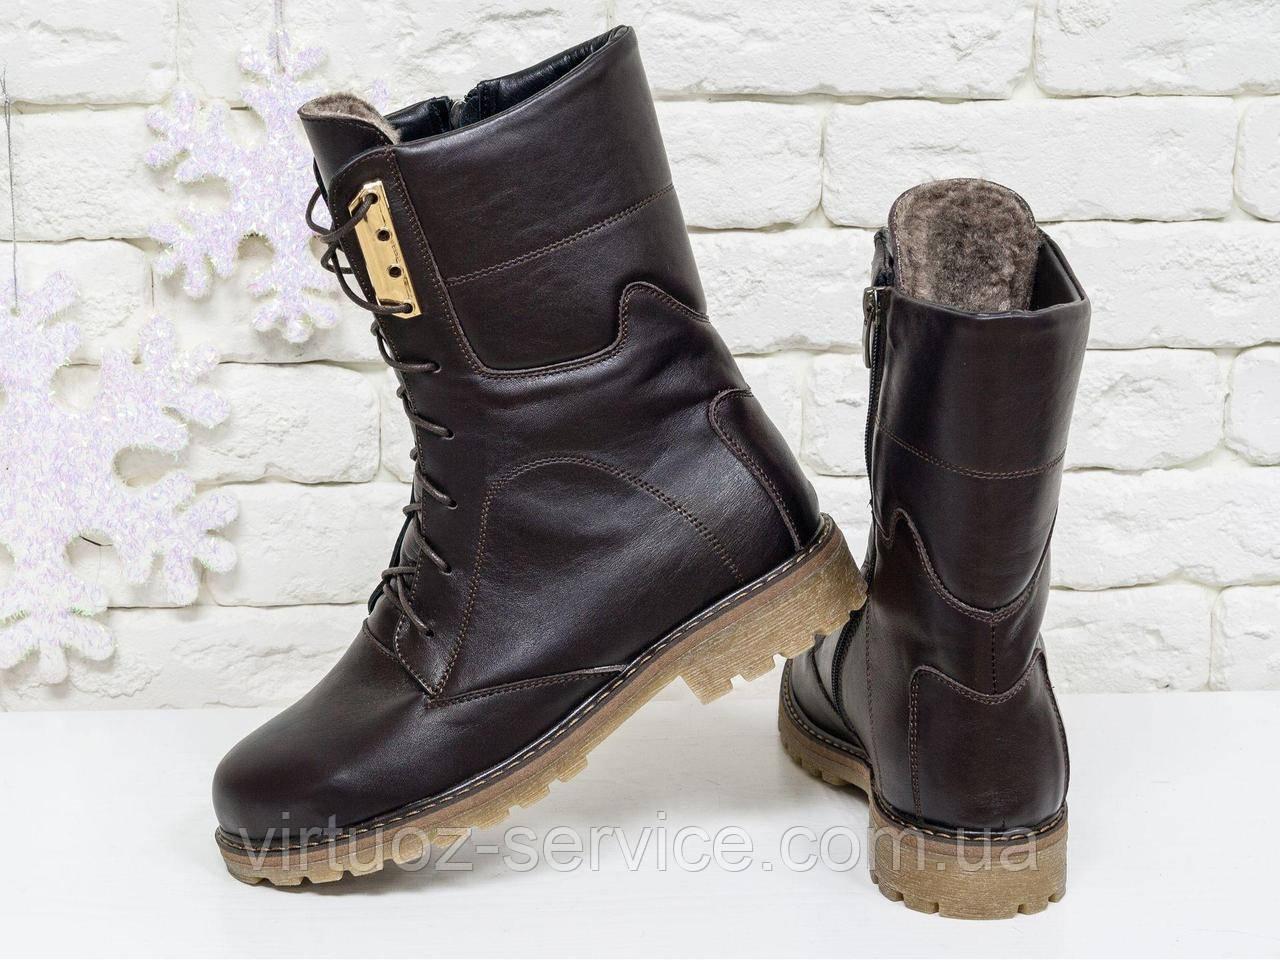 Ботинки женские Gino Figini Б-44-06 из натуральной кожи 39 Коричневый